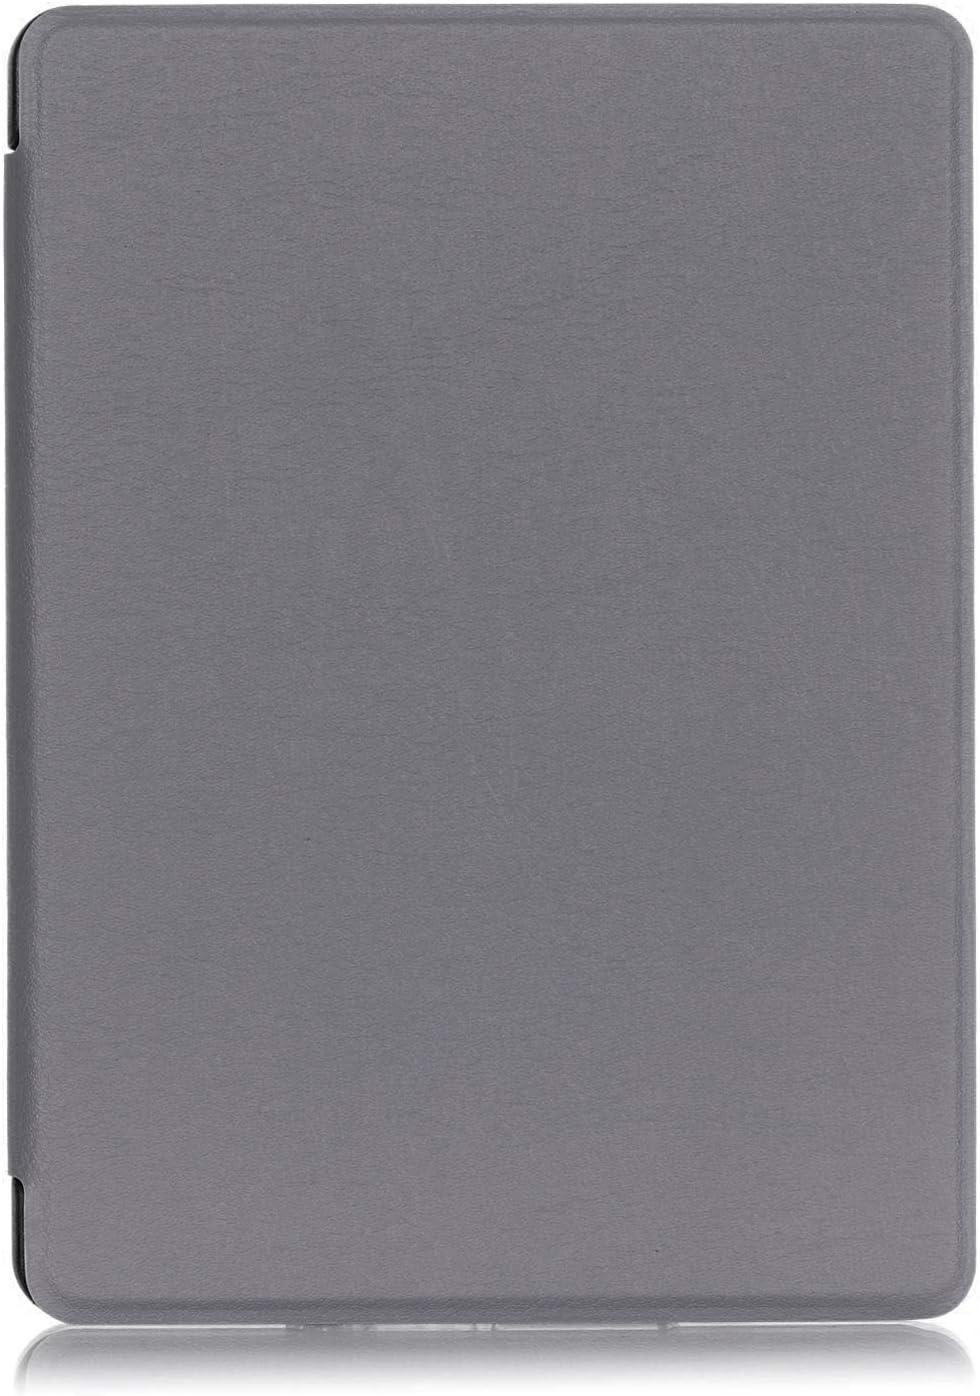 Komi Pu Leder Schutzhülle Kompatibel Mit Kindle Paperwhite 4 E Reader 10th Generation 2018 Version Ebook Schutz Cover Elektronik